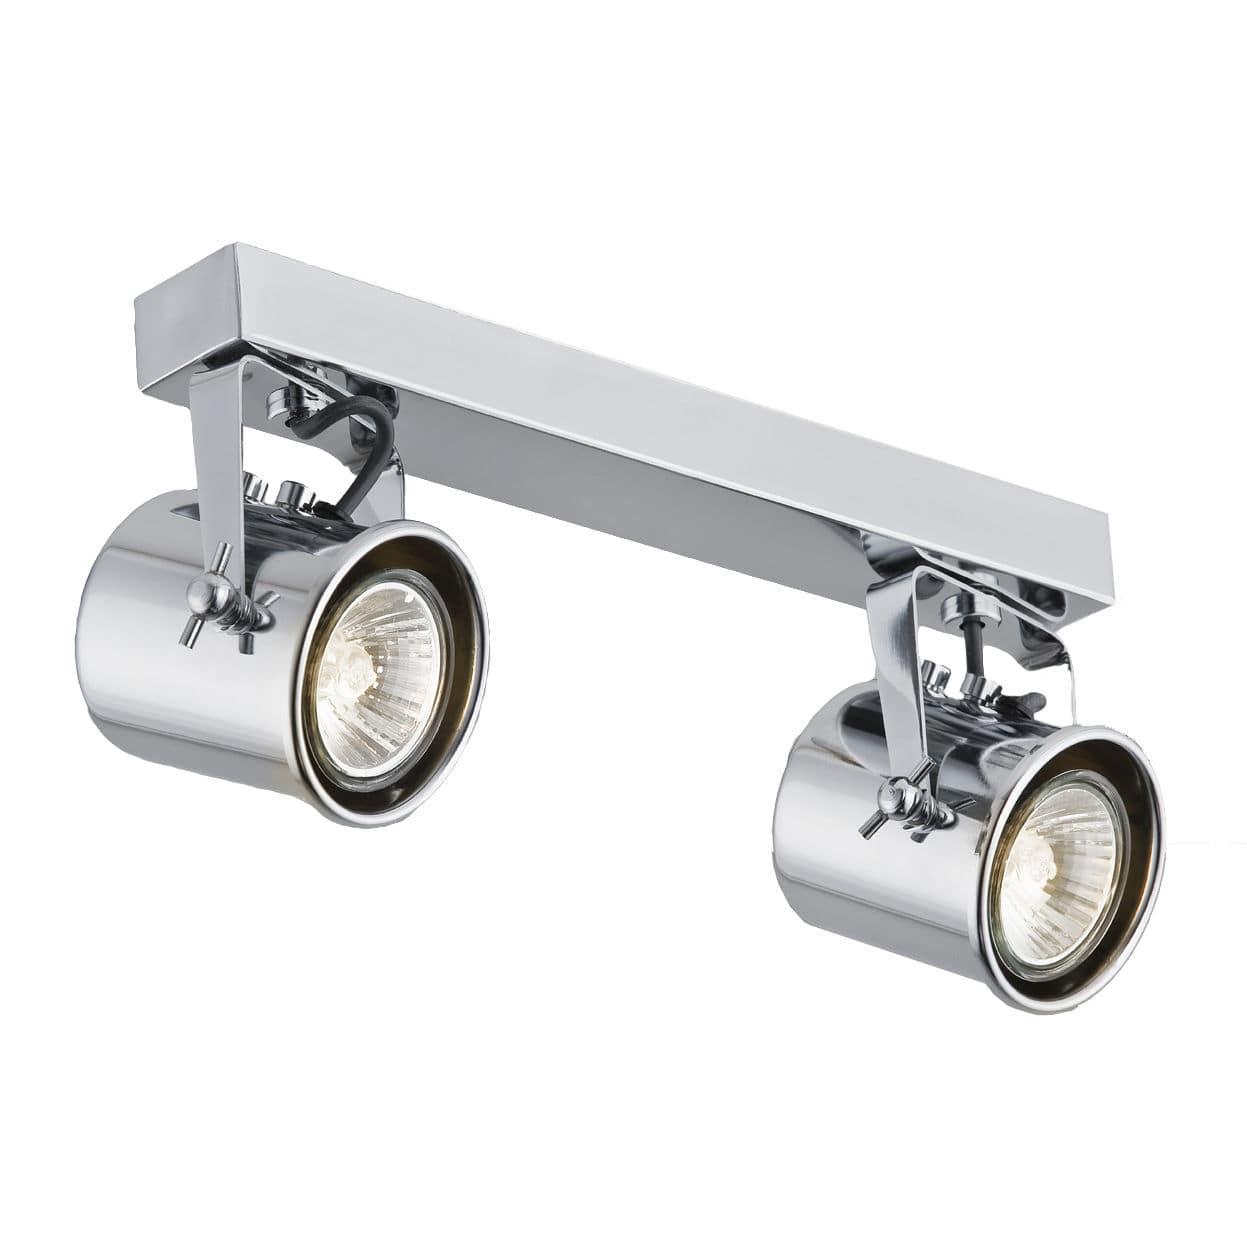 alter lighting. Ceiling-mounted Spotlight / Indoor Halogen Round - ALTER 2 Alter Lighting E